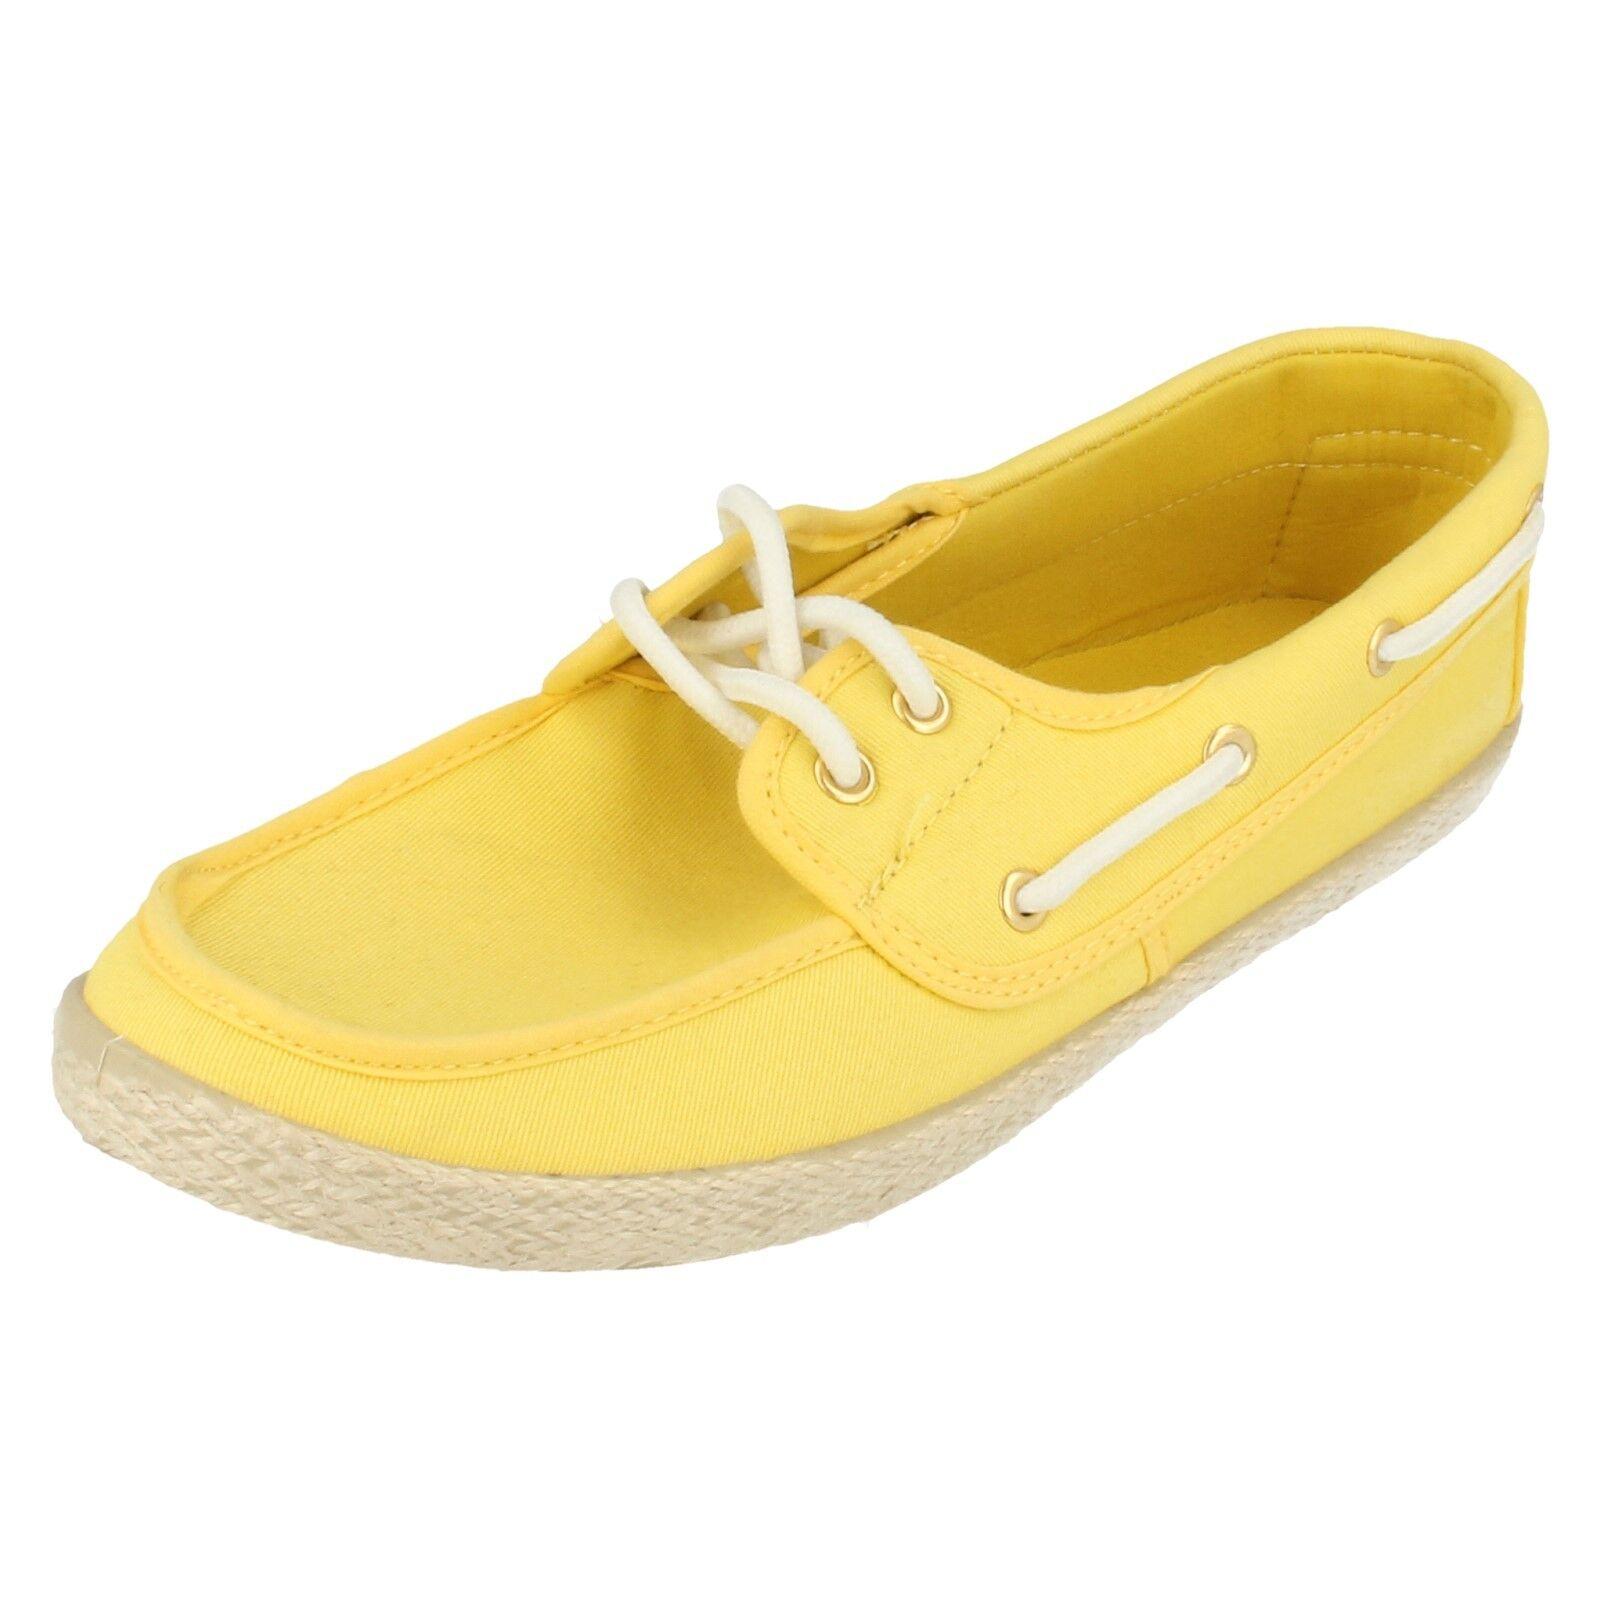 Mujer Plano Spot On Amarillo Lona Plano Mujer Zapato Cubierto 306798